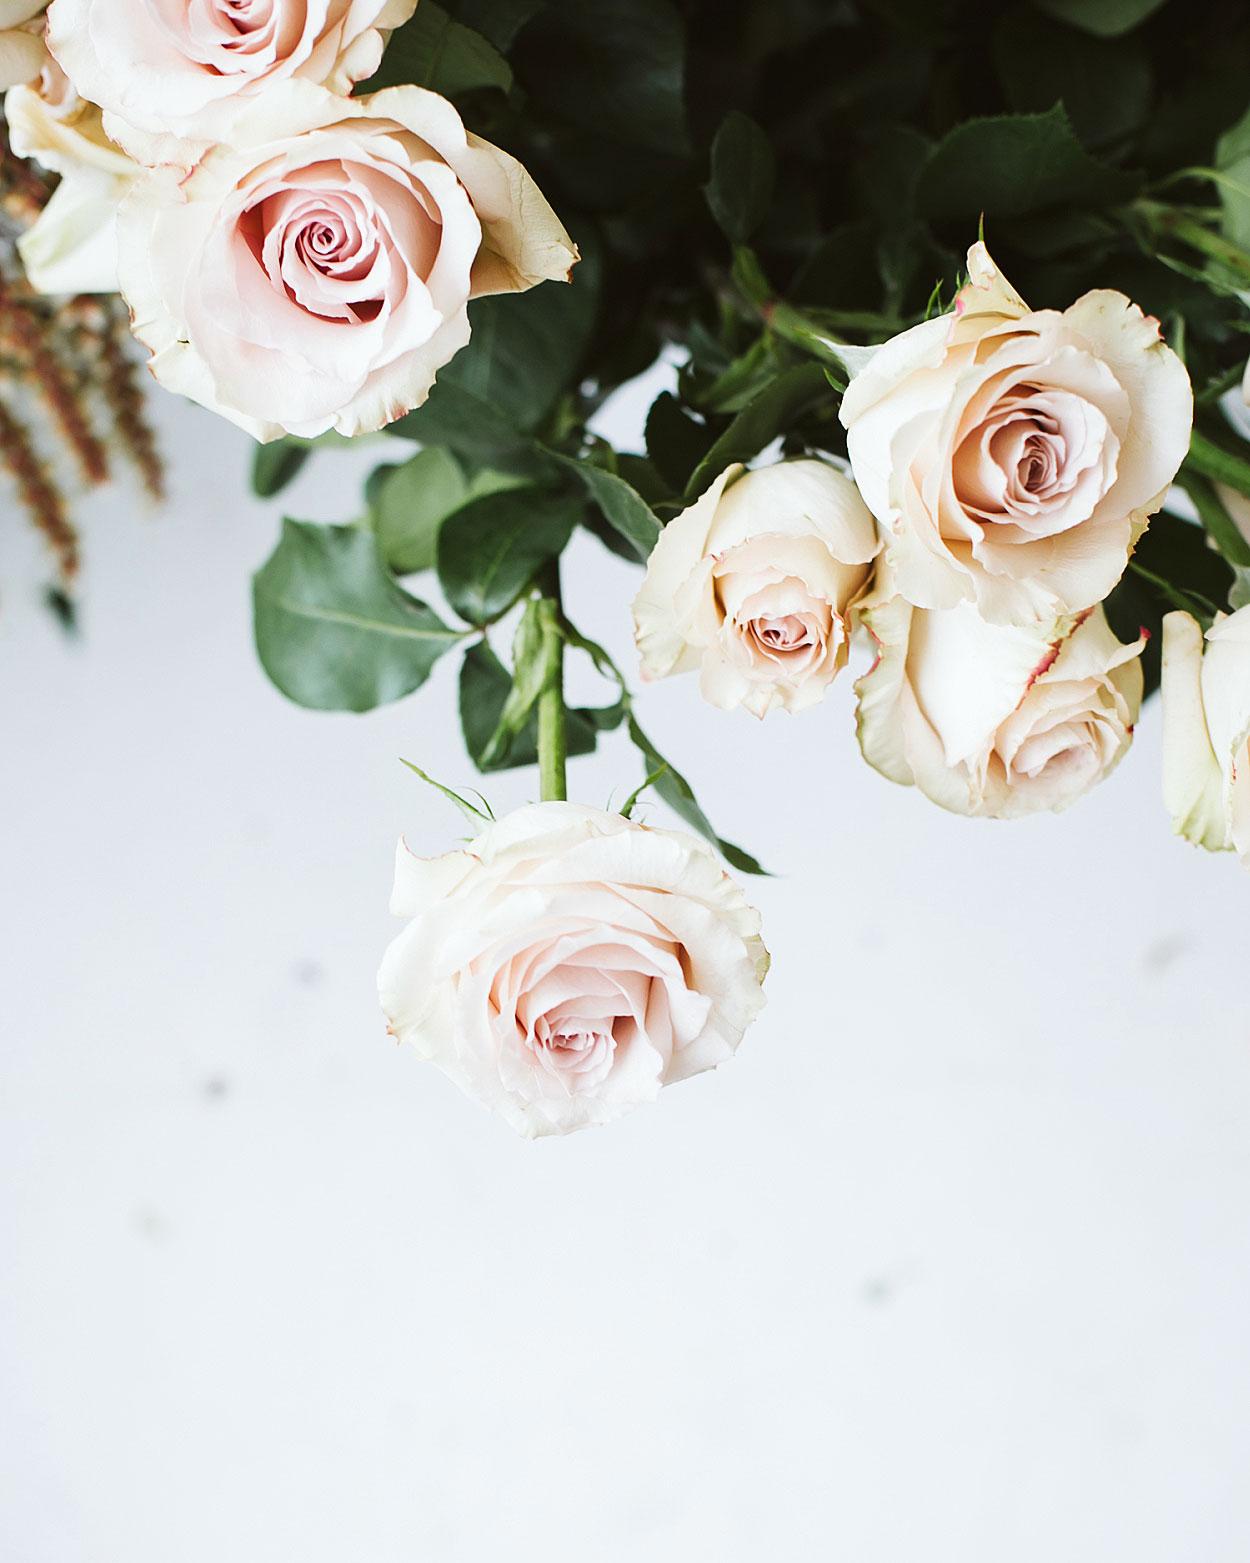 romantic-wedding-flowers-standard-rose-0516.jpg